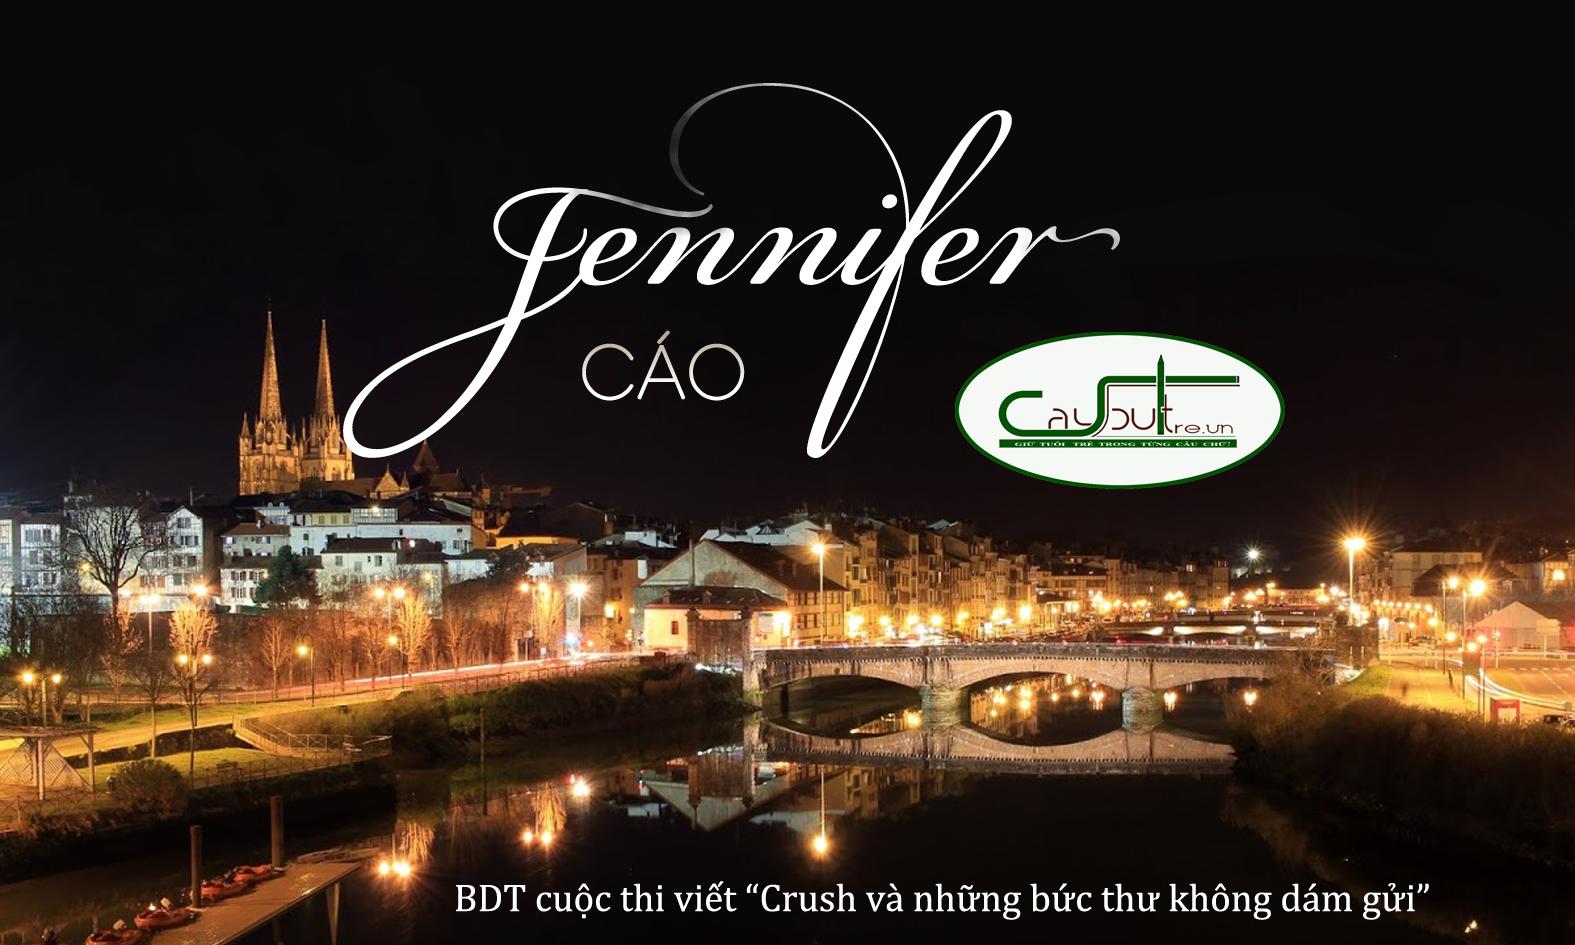 bdt1 - [Cuộc thi] Jennifer - Tác giả Cáo